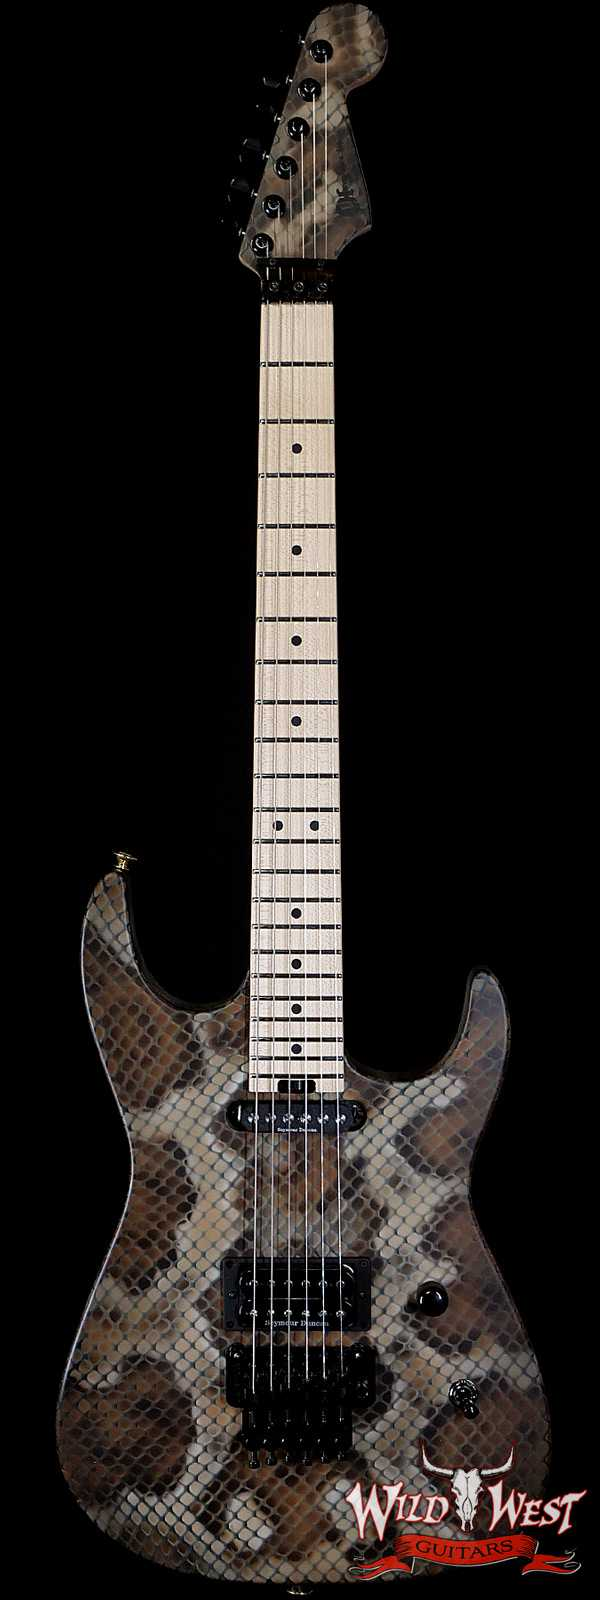 Charvel USA Warren DeMartini Signature Snake Guitar SH Floyd Rose Snakeskin Graphic Signed By Warren DeMartini